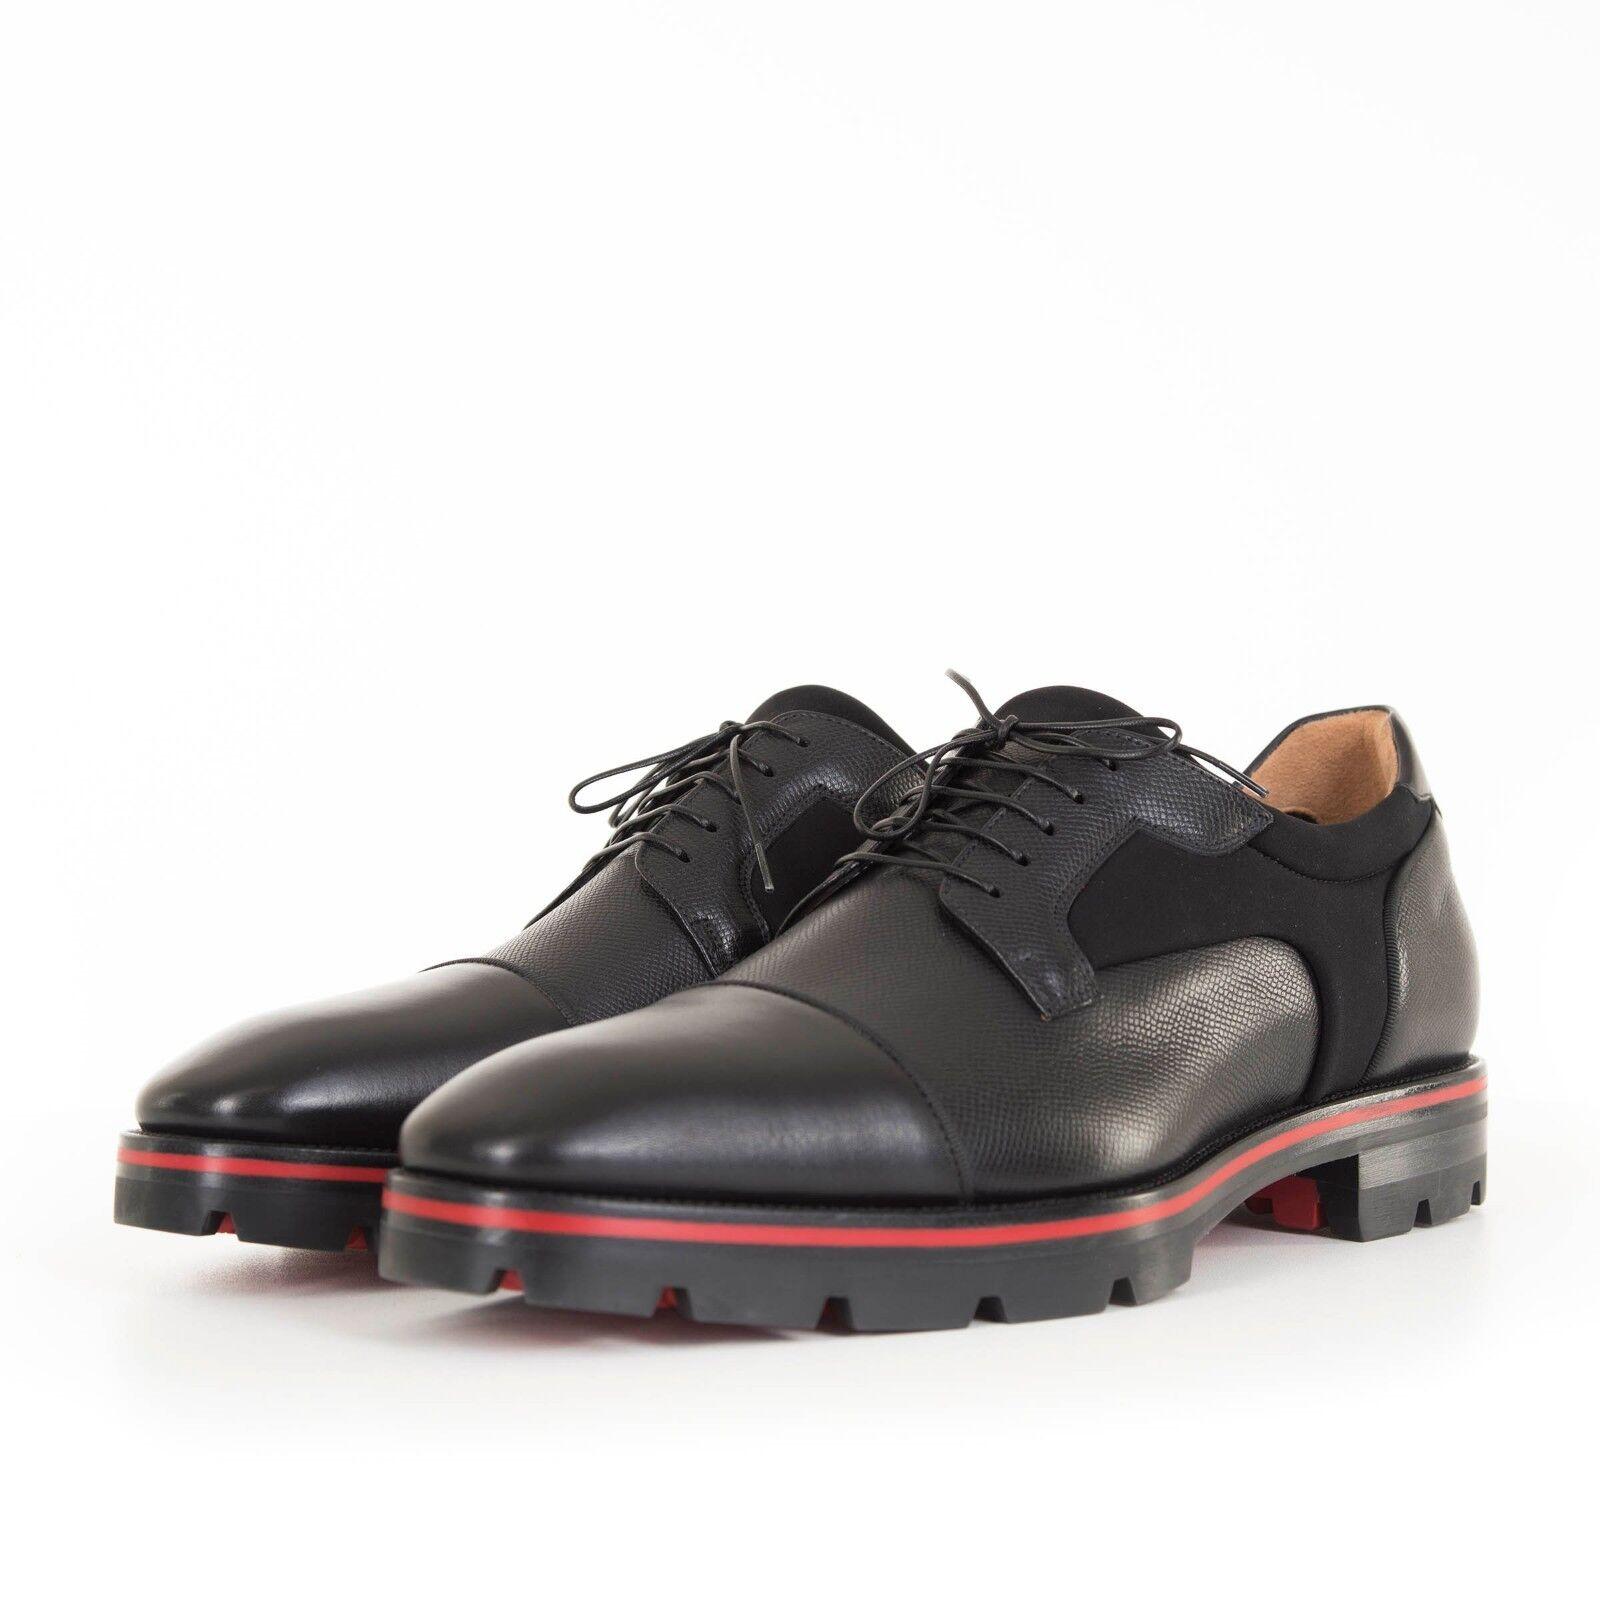 prezzi bassissimi CHRISTIAN LOUBOUTIN 1095  nero Leather Leather Leather Mika Sky Derby scarpe  a prezzi accessibili